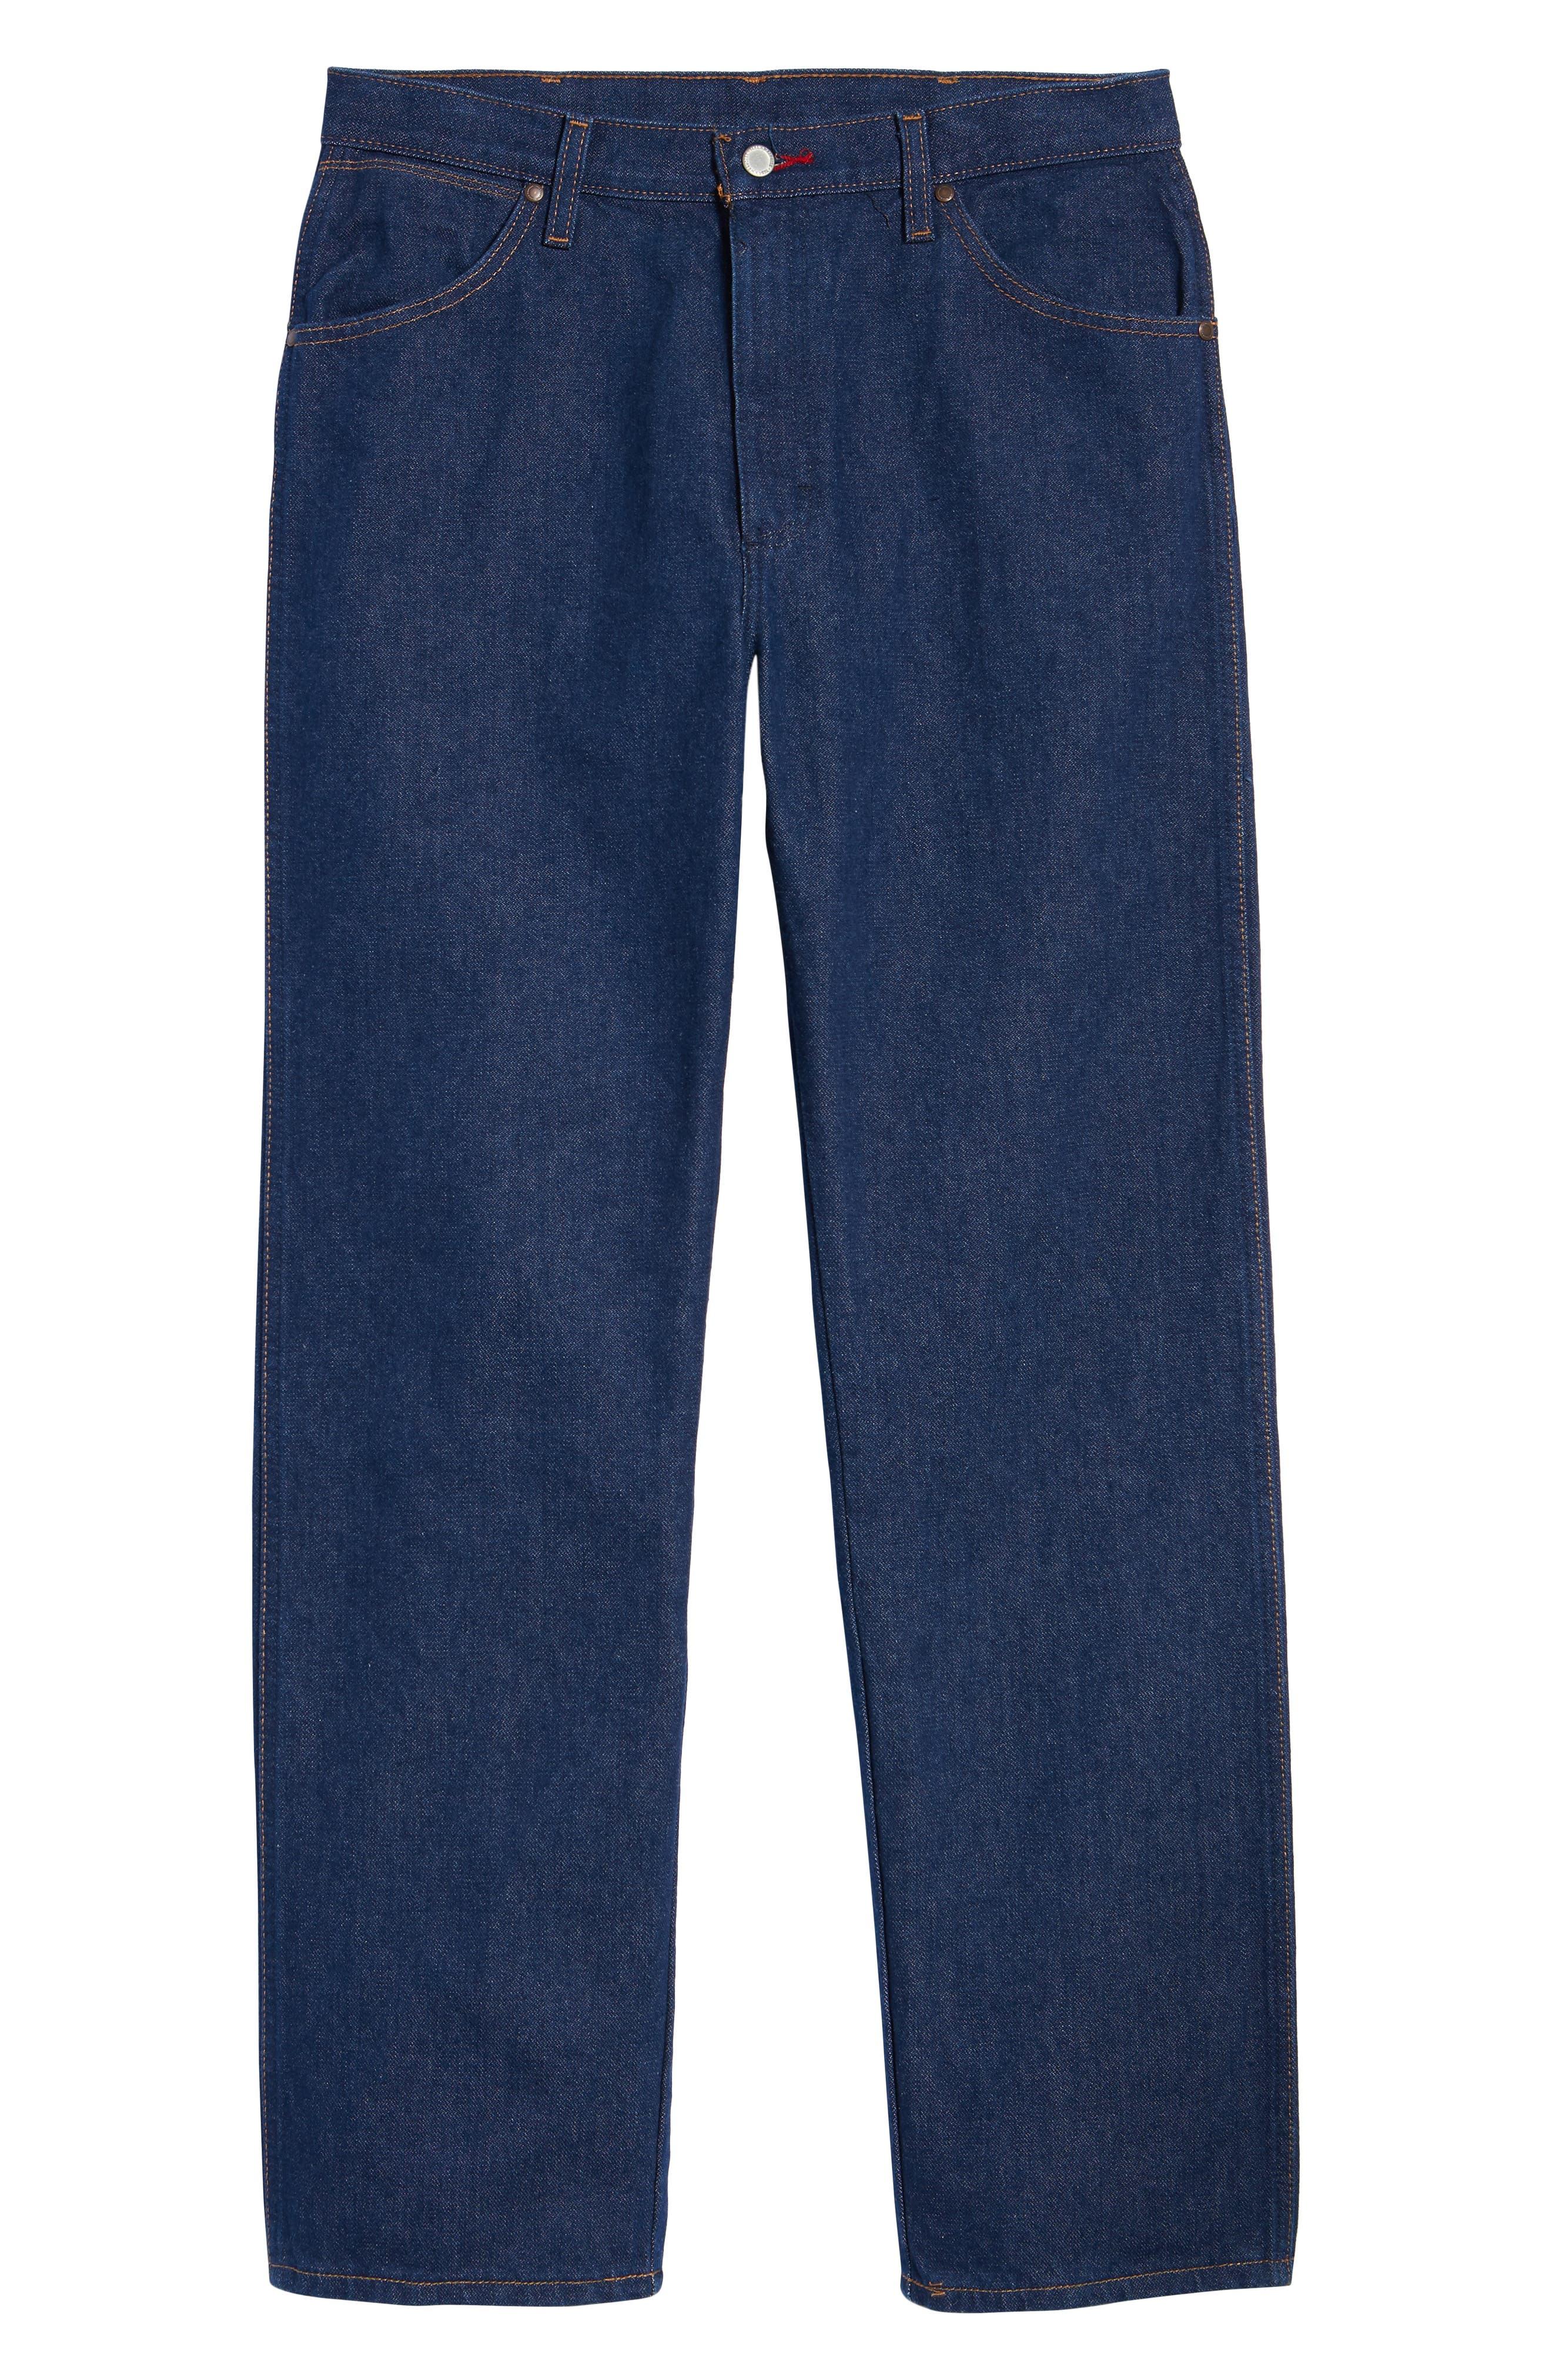 x Wrangler Straight Leg Jeans,                             Alternate thumbnail 6, color,                             PREWASH INDIGO